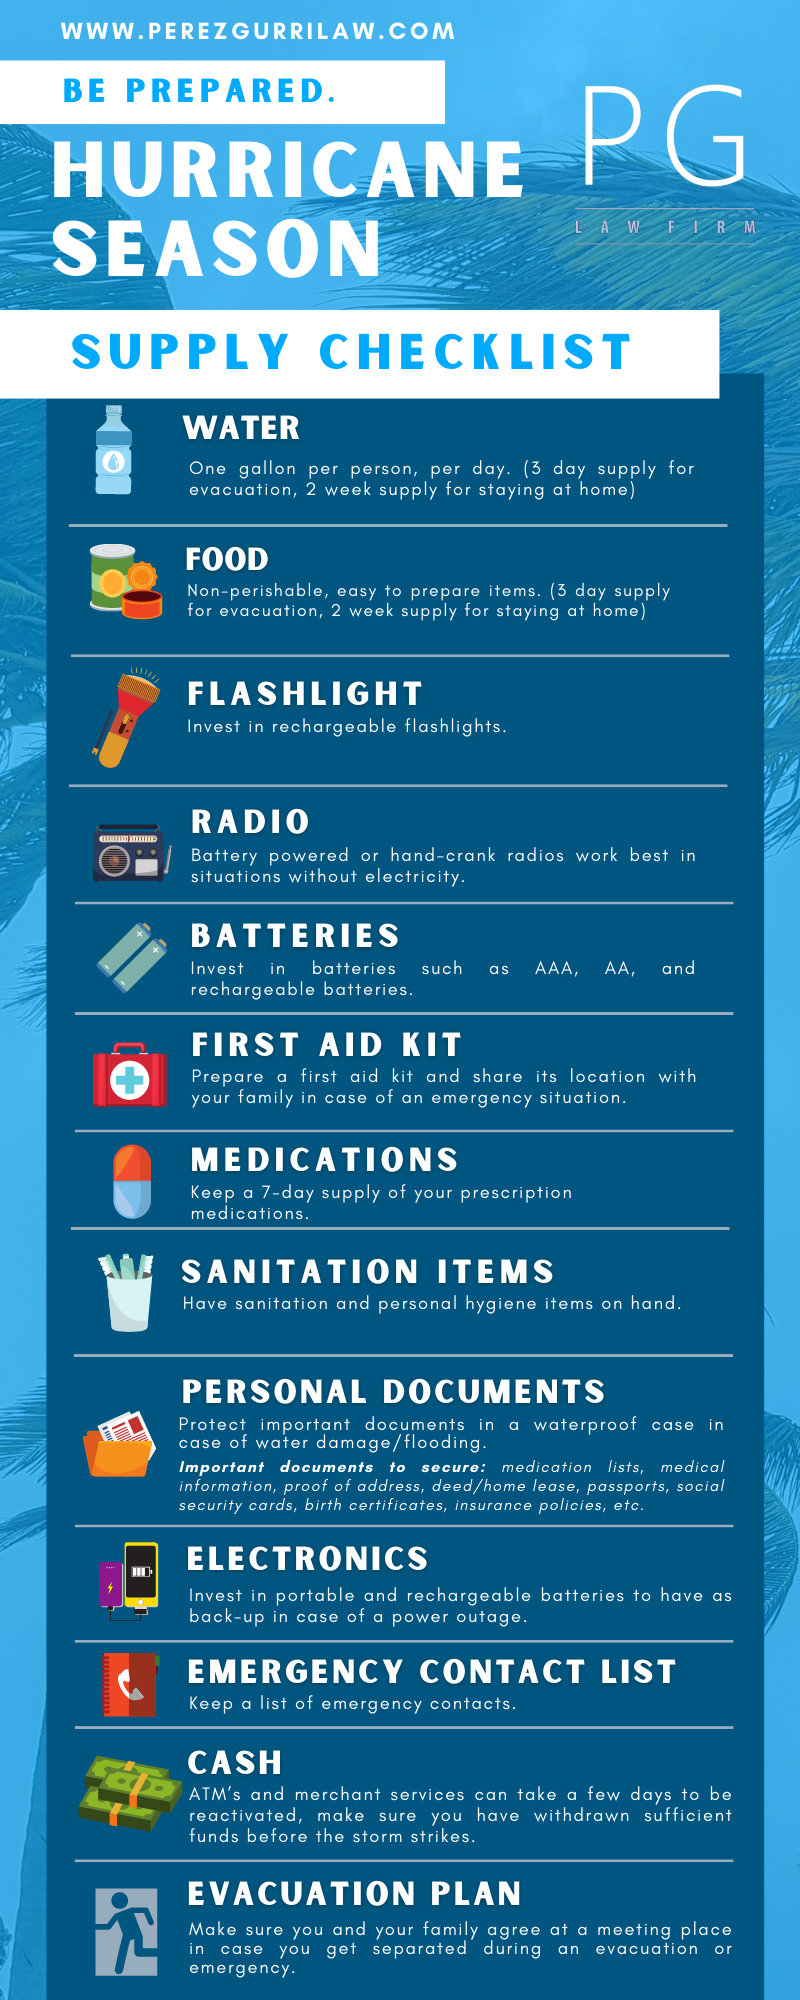 Hurricane Season 2019 Florida - Supply Checklist